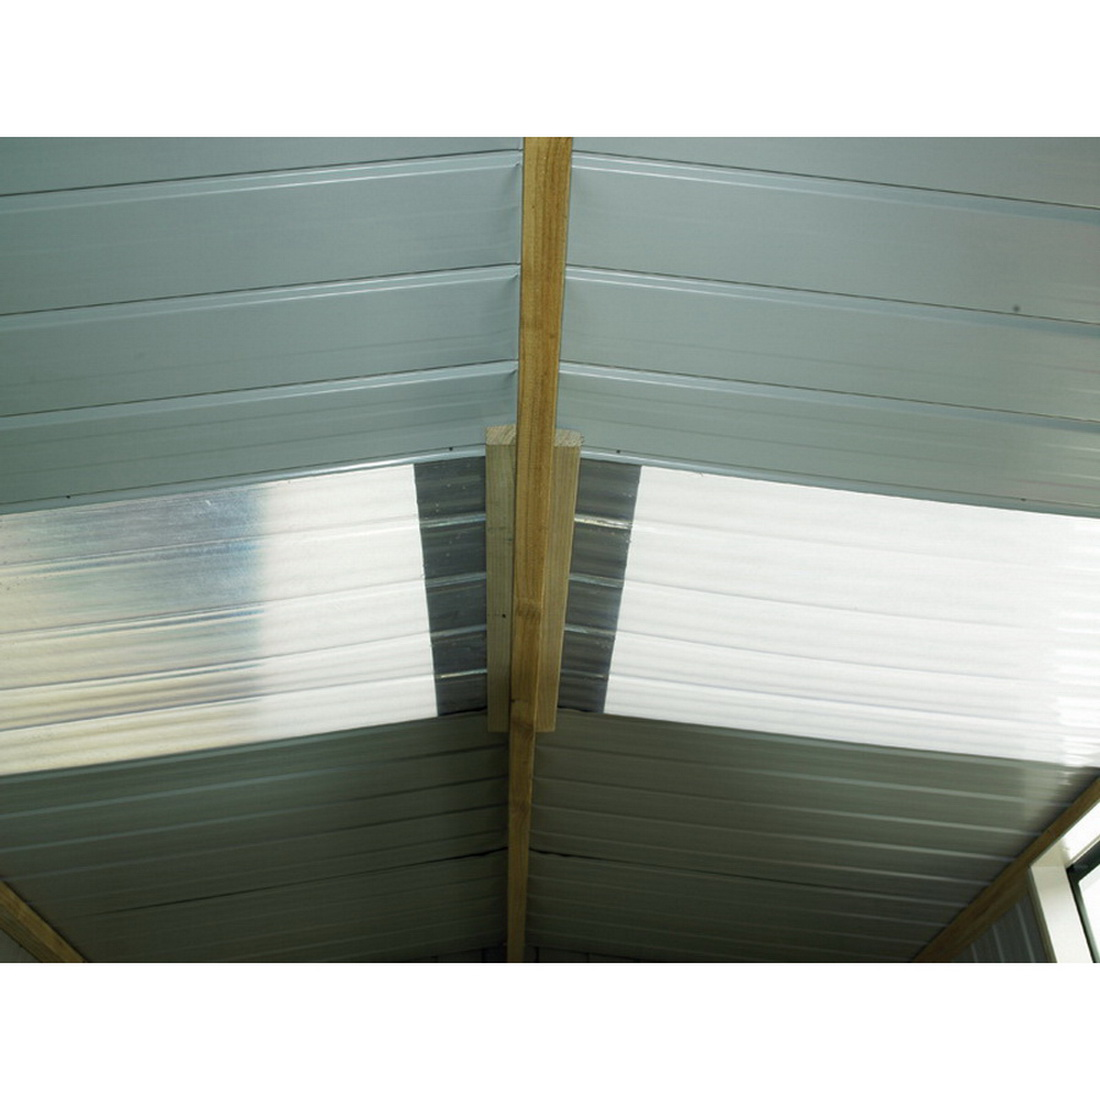 Kiwi Double Side Standard Clear Roof Panel Polycarbonate KCRPSB